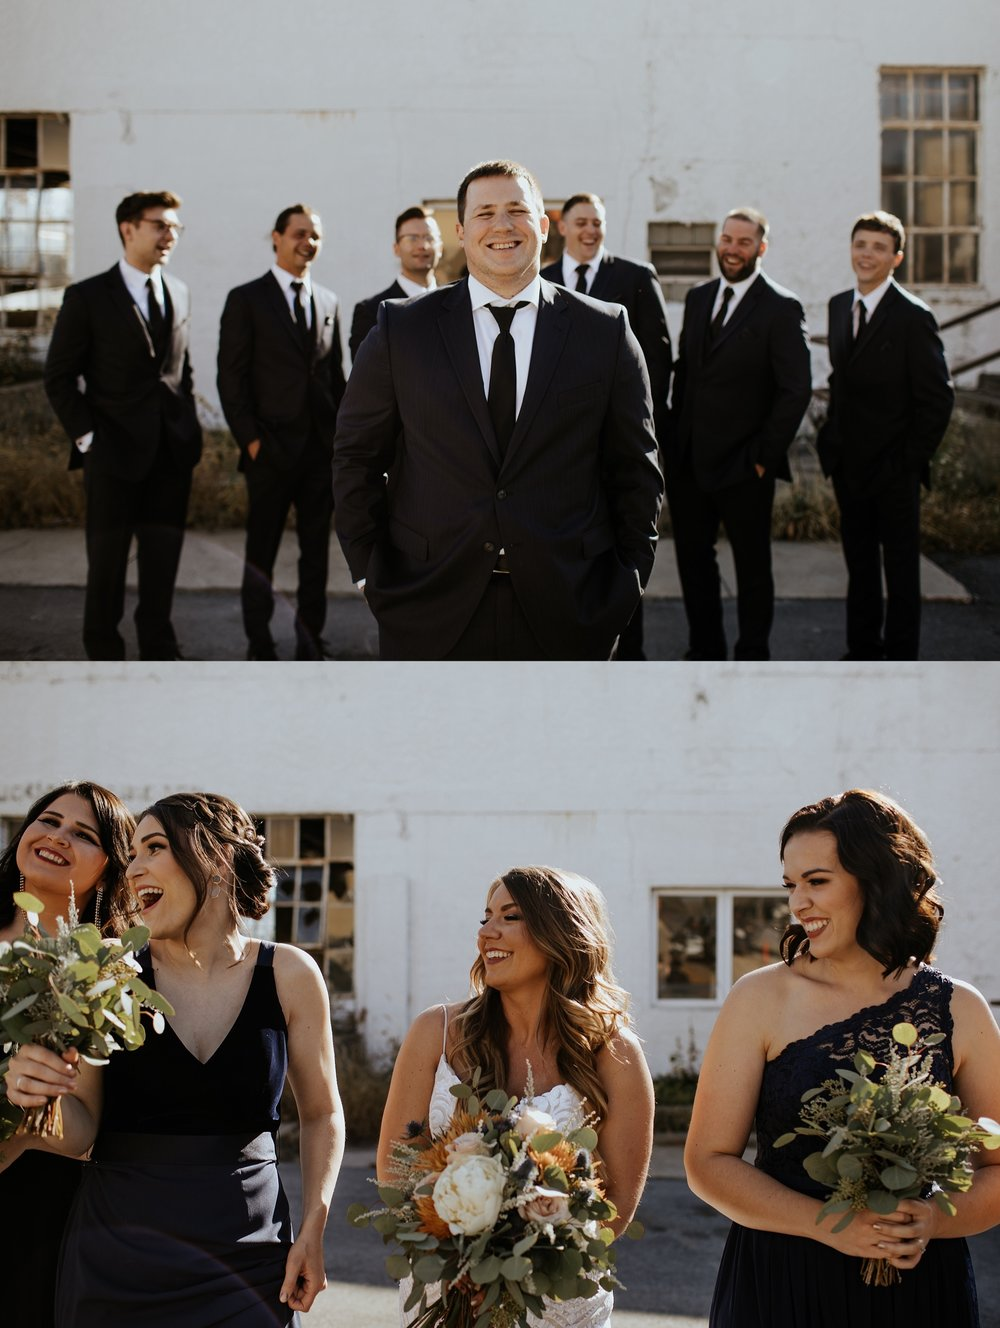 The Omar Arts and Events Center Wedding in Midtown Omaha Nebraska  - Trin Jensen Photography_0017.jpg